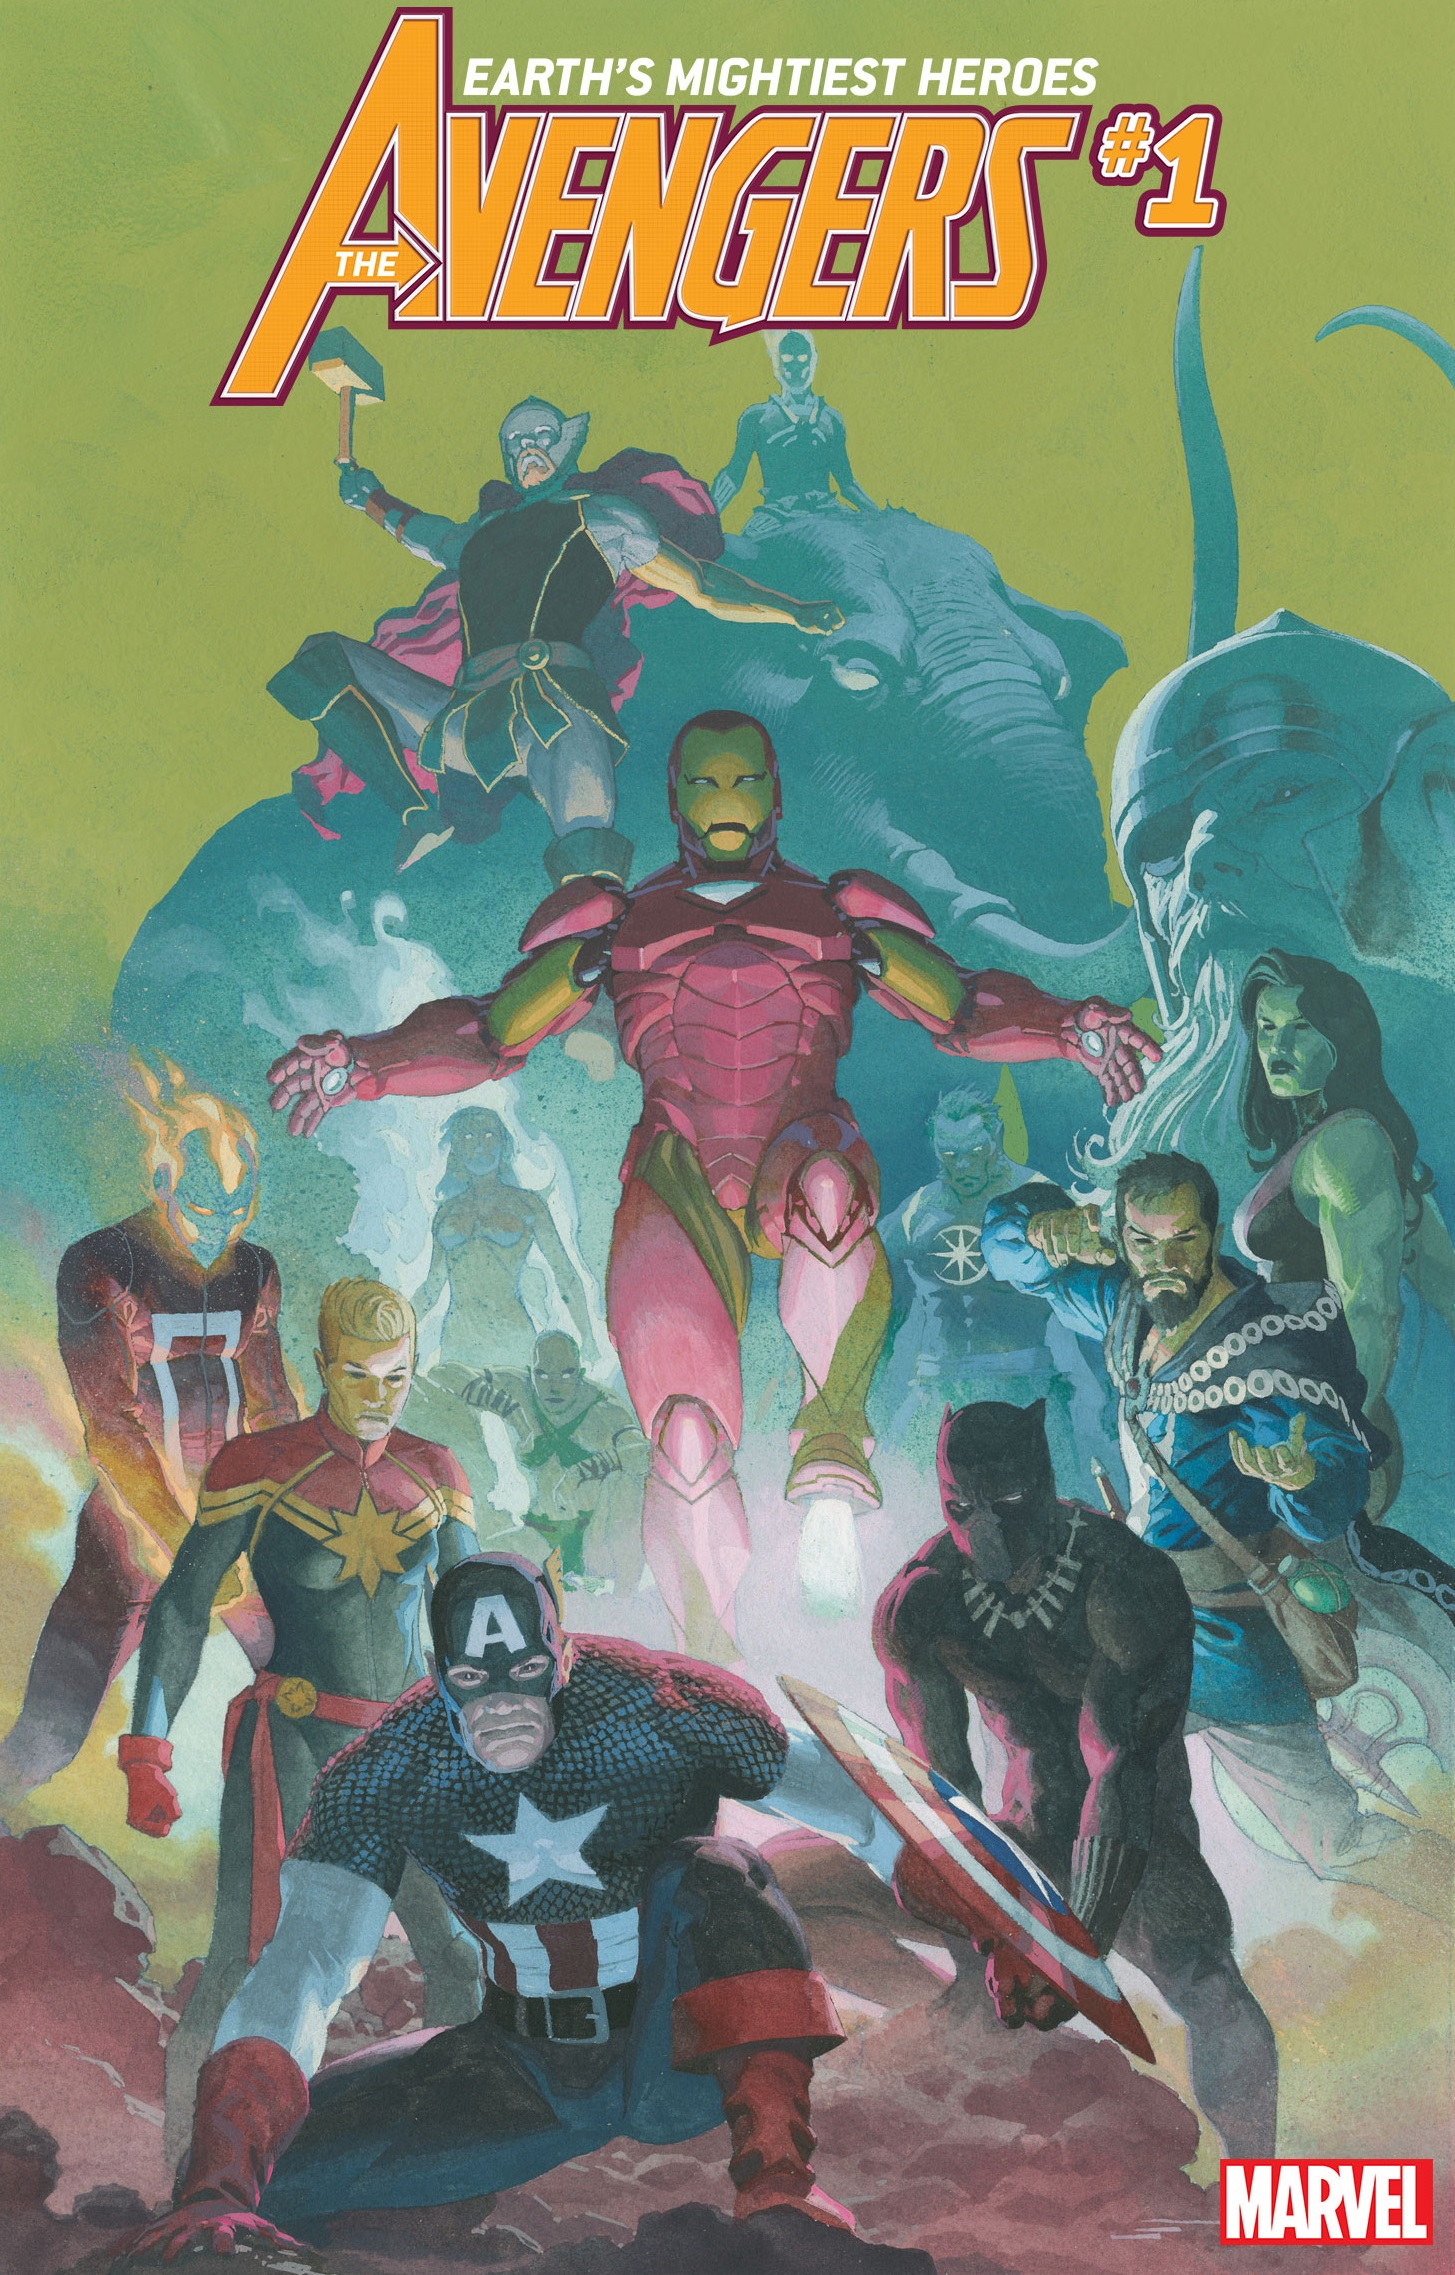 avengers1esad